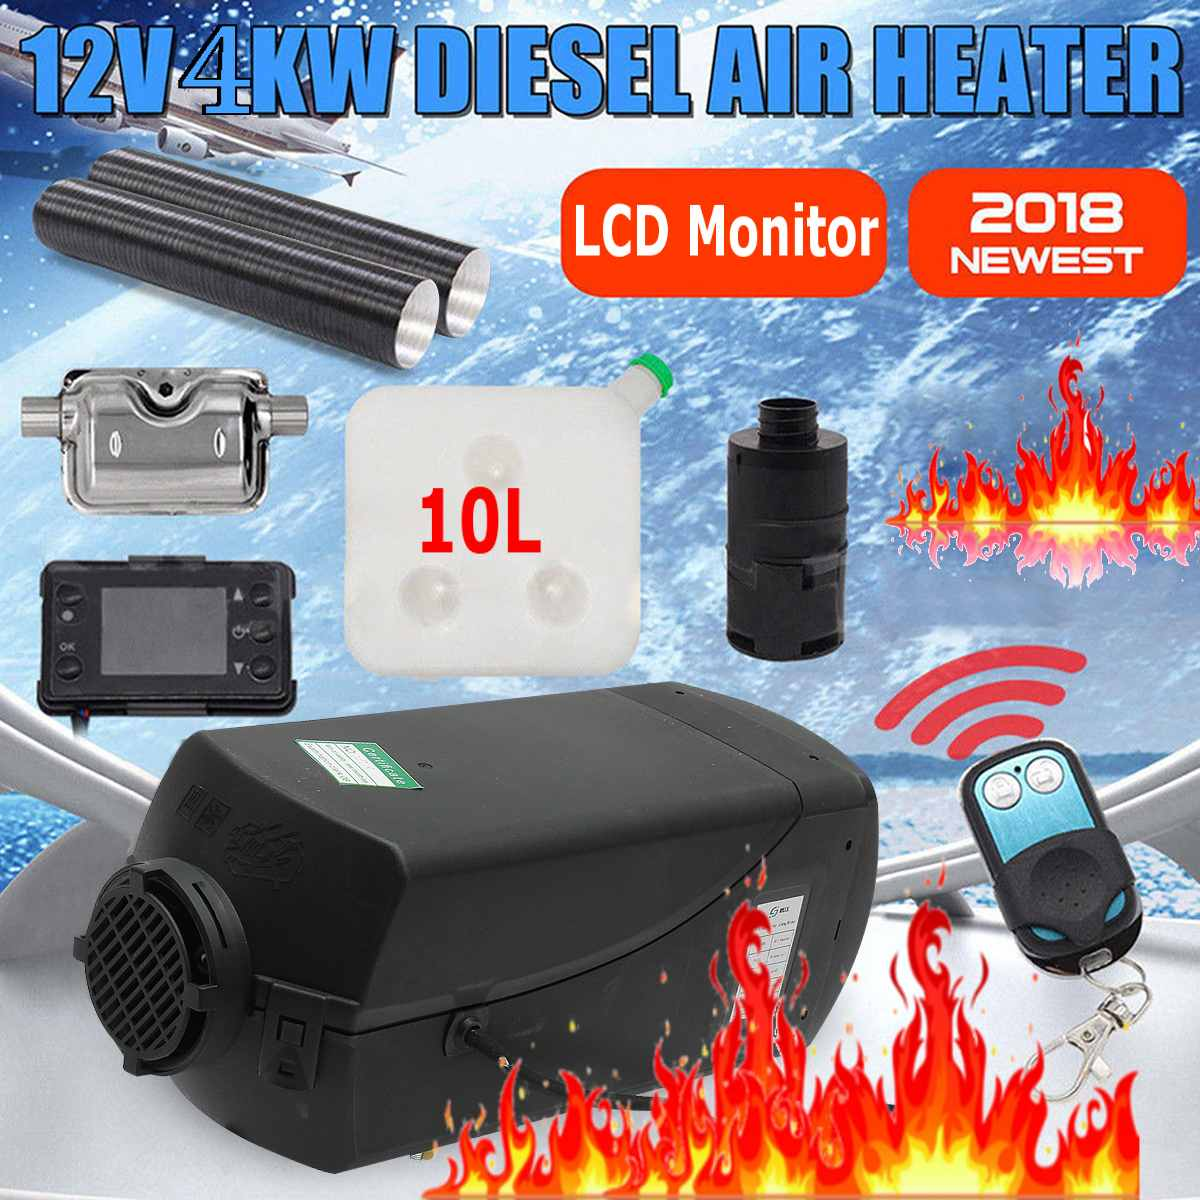 Knob Switch M2 12V 5KW Air Diesel Fuel Heater For Trucks Boats Bus W// 10L Tank